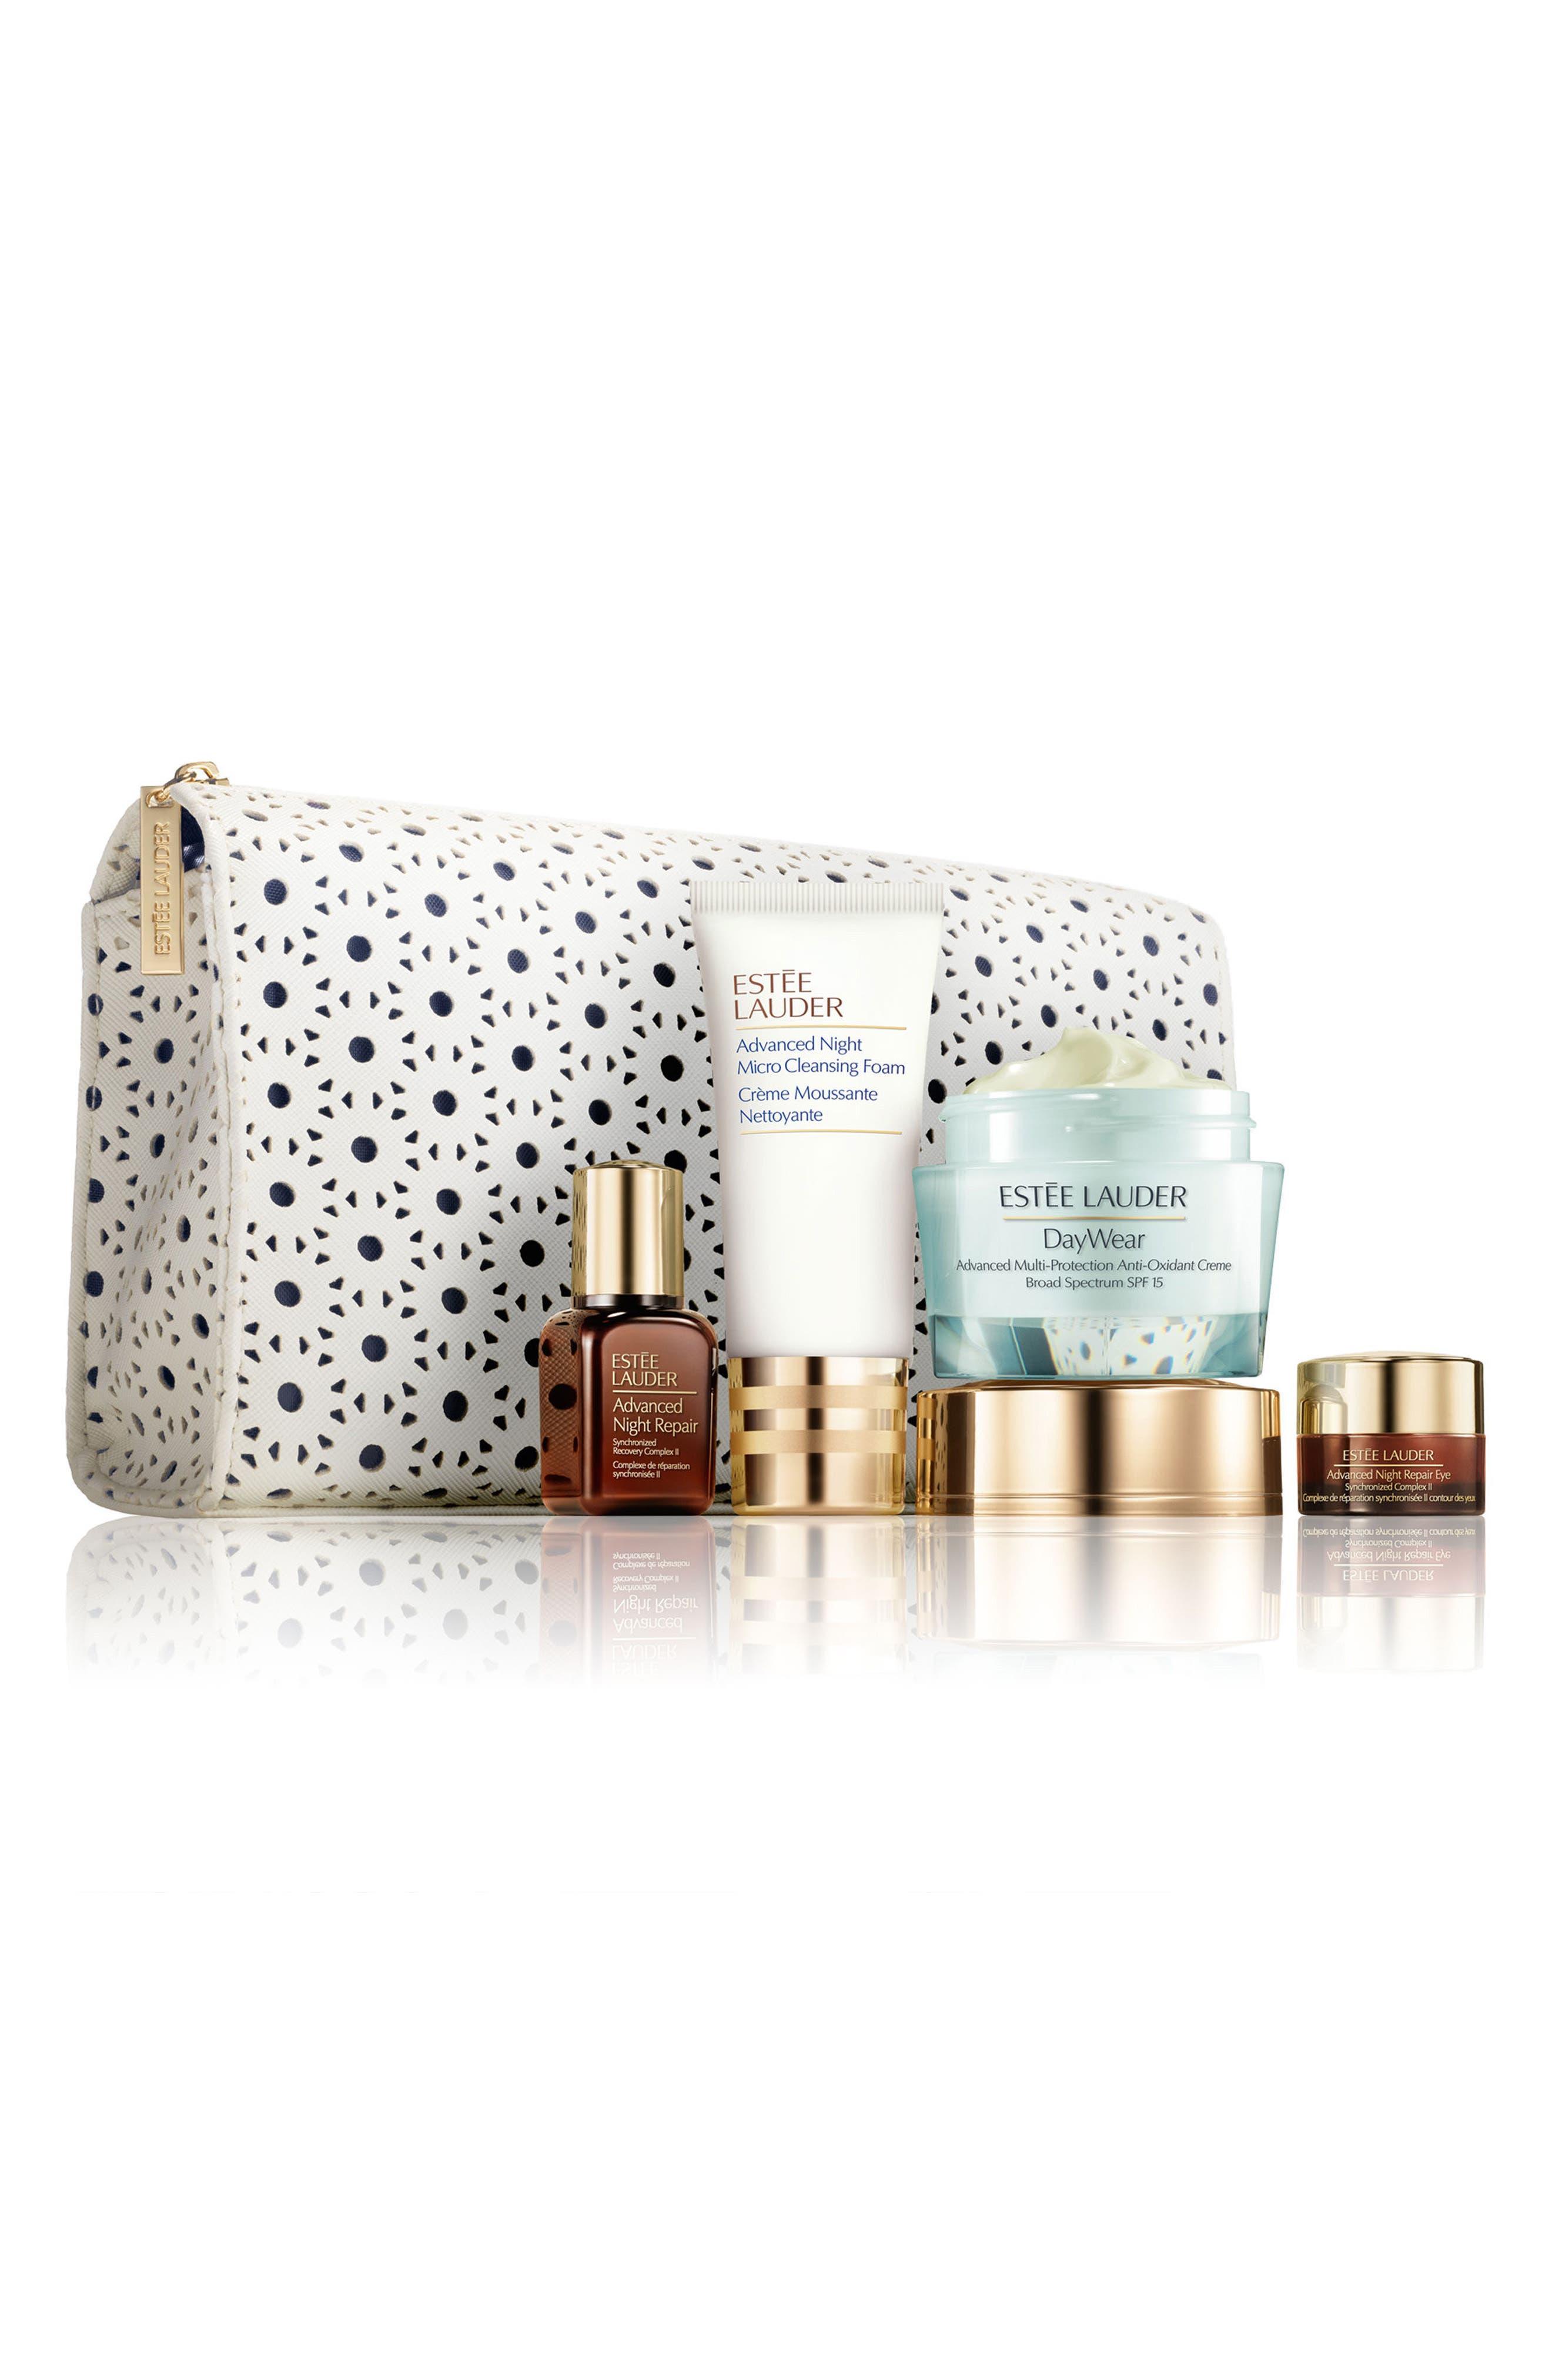 Estée Lauder Beautiful Skin Essentials Prevention Collection (Limited Edition) ($125 Value)